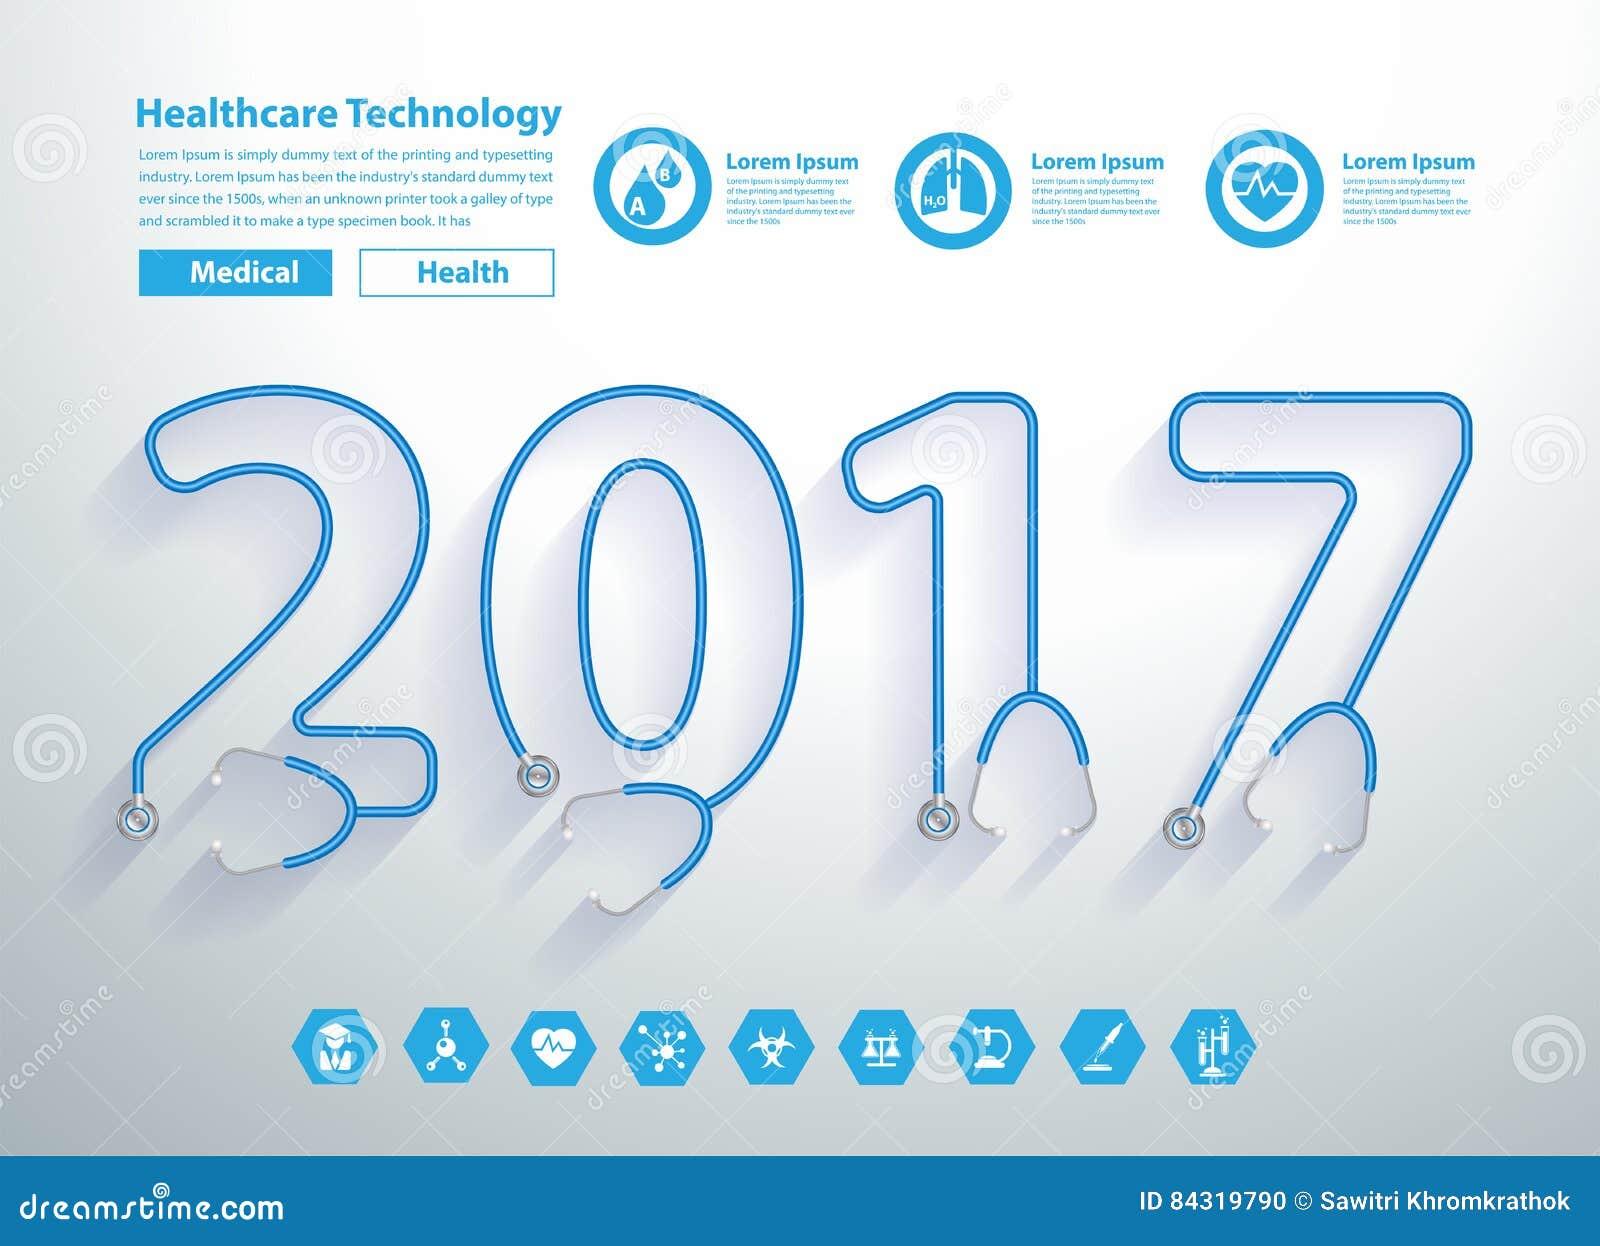 Calendar Cover Design Ideas : Stethoscope heart creative new year design stock